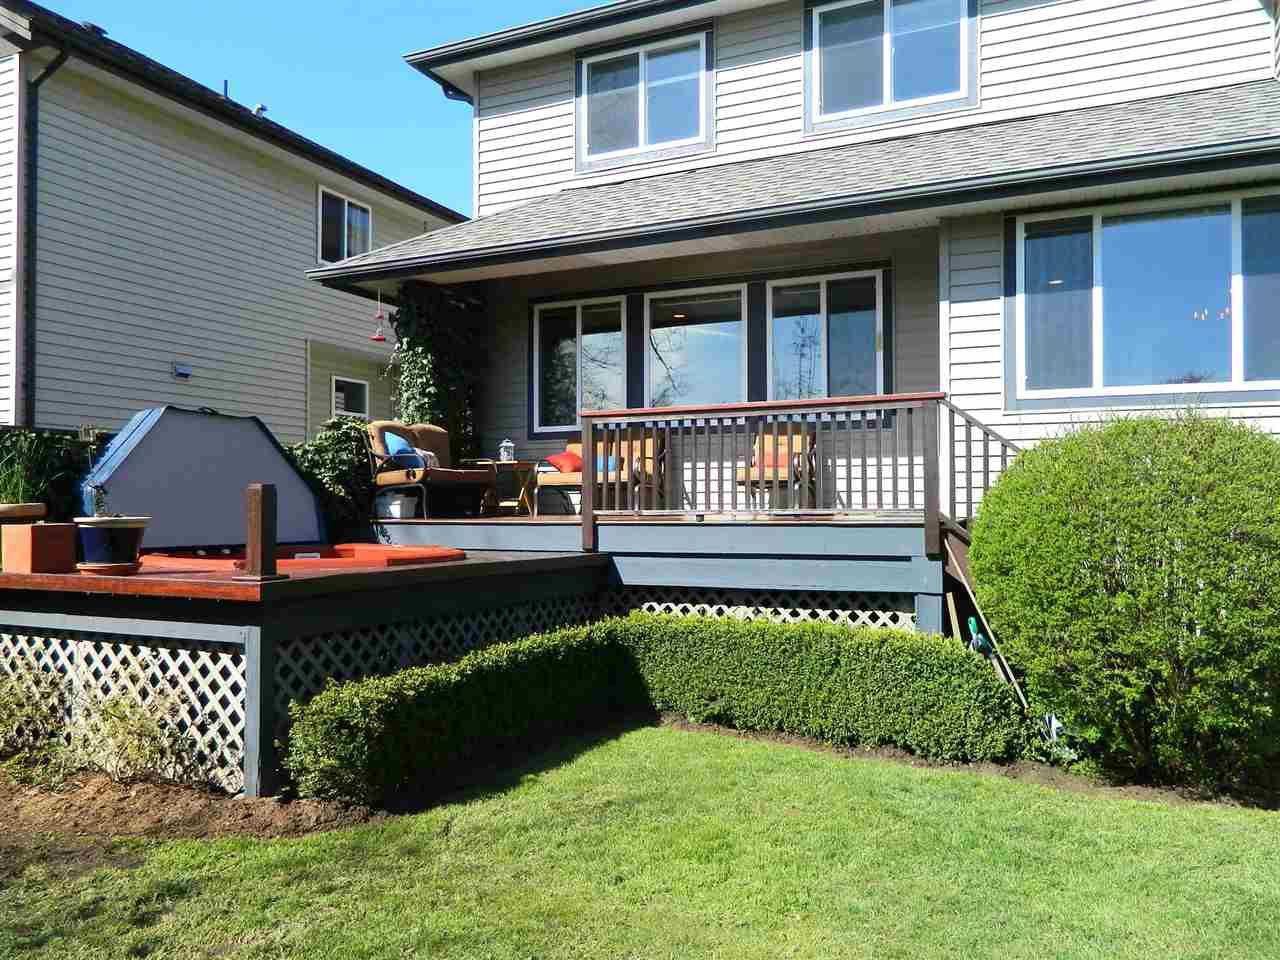 Photo 19: Photos: 24332 104 AVENUE in Maple Ridge: Albion House for sale : MLS®# R2051414